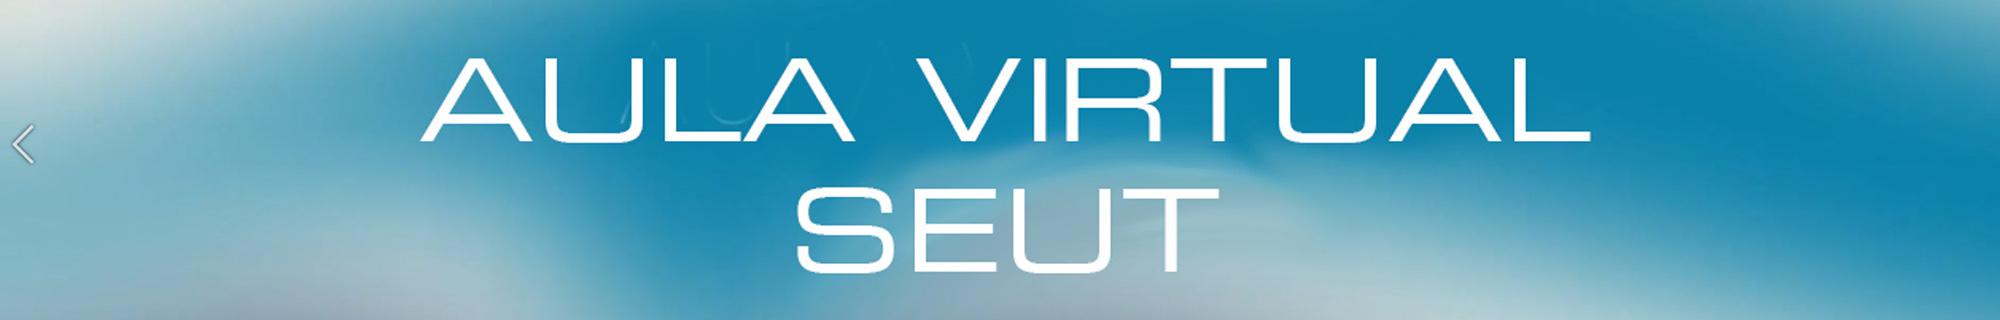 Aula Virtual SEUT